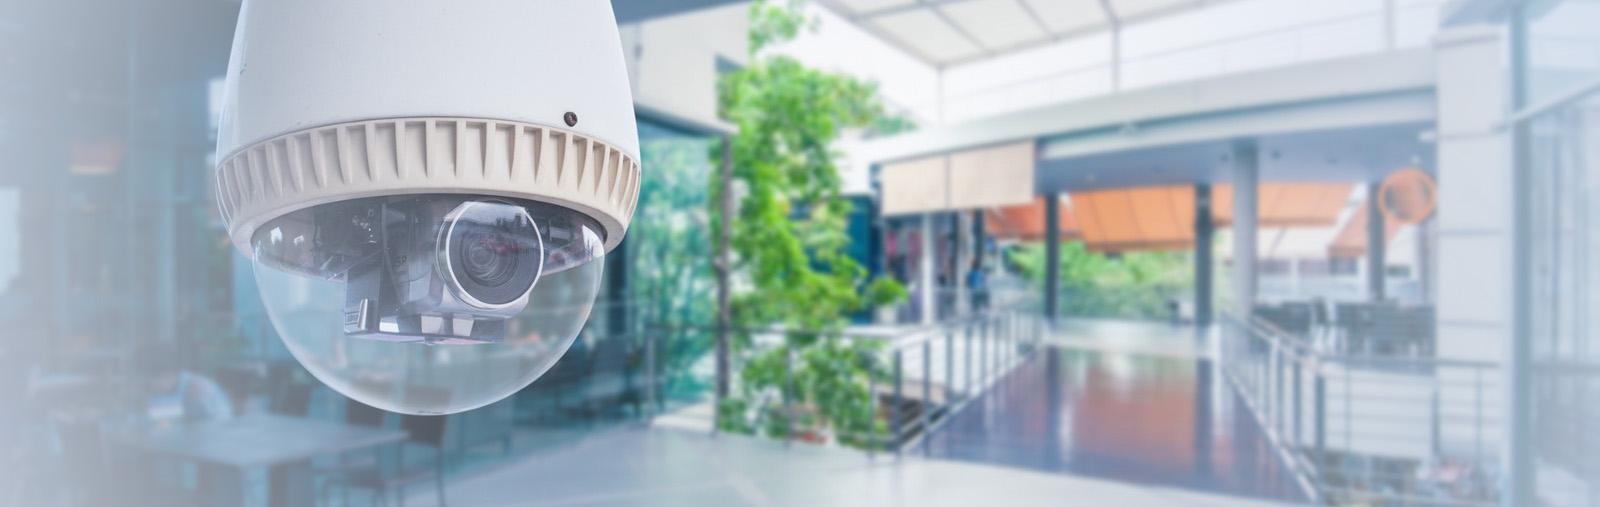 wide range of CCTV cameras, Intruder alarm systems, complete security solutions